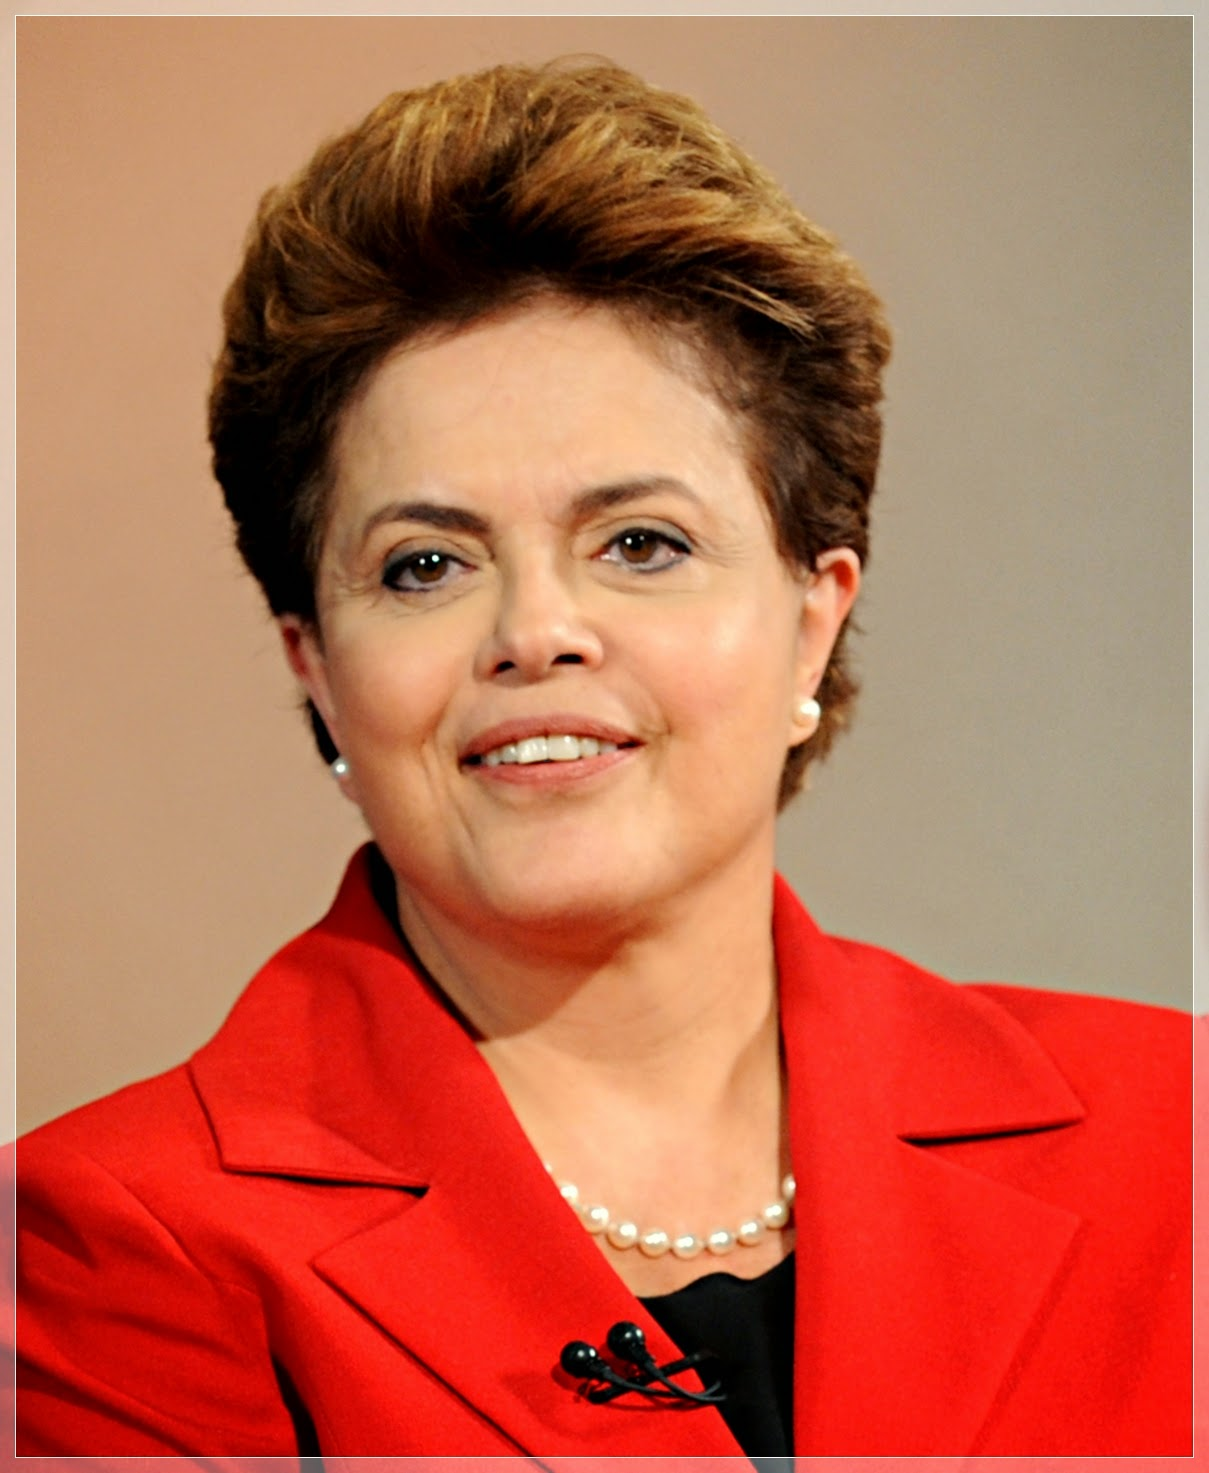 Corrida presidencial 2014: a história política de Dilma Rousseff, Aécio Neves e Eduardo Campos – Por Cristiane Lopes*